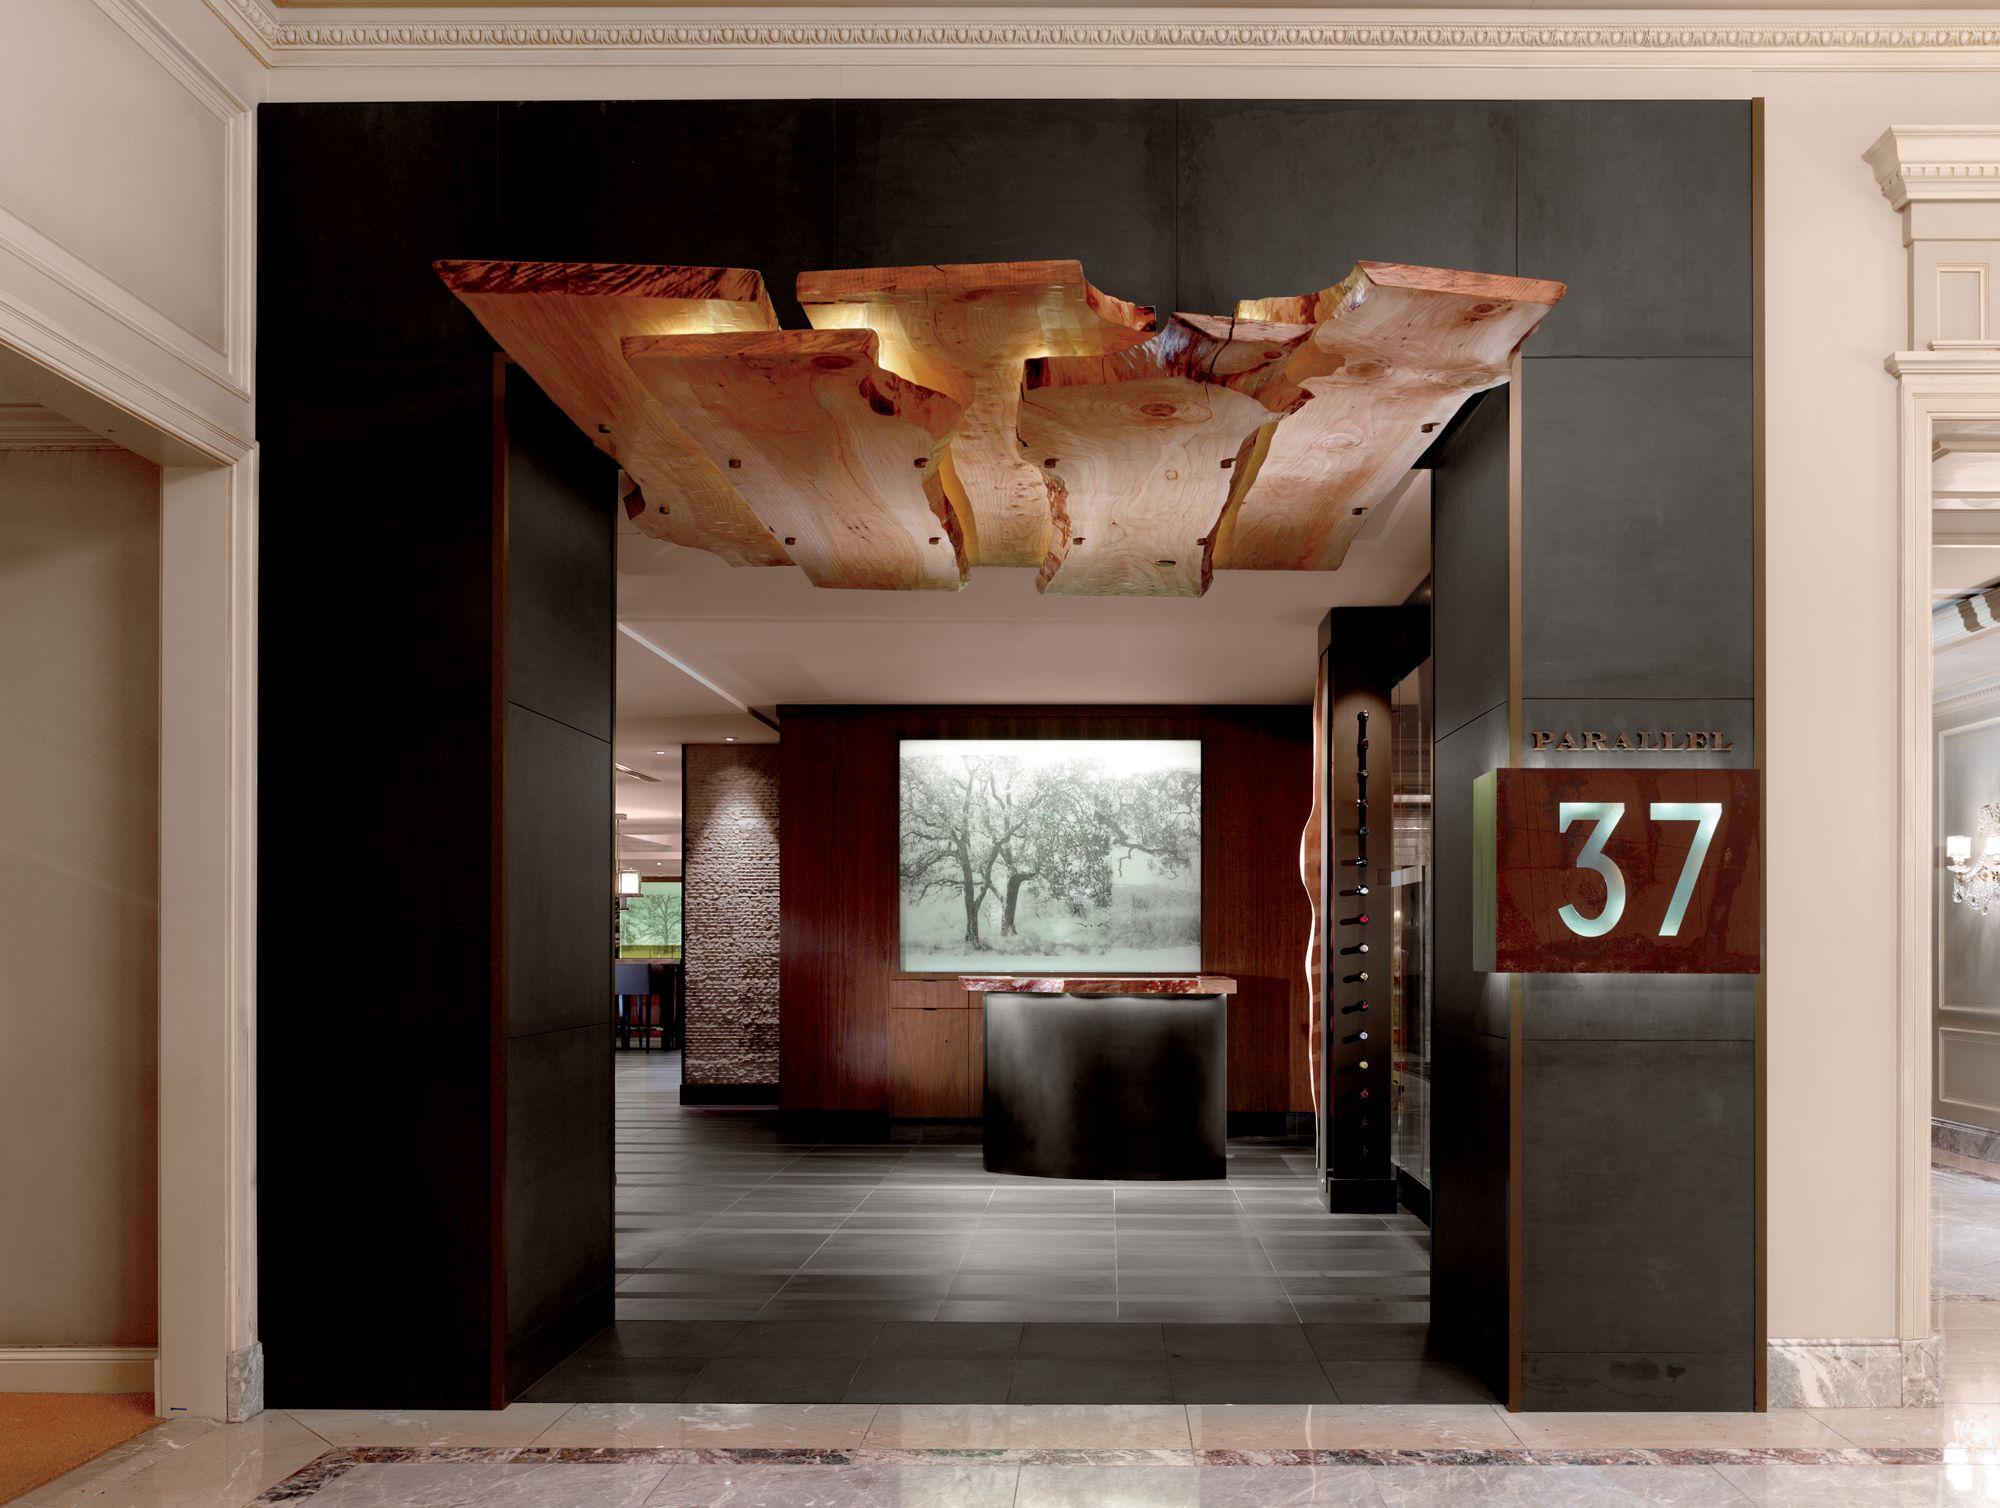 Downtown 5 Star Nob Hill Hotels | The Ritz-Carlton, San